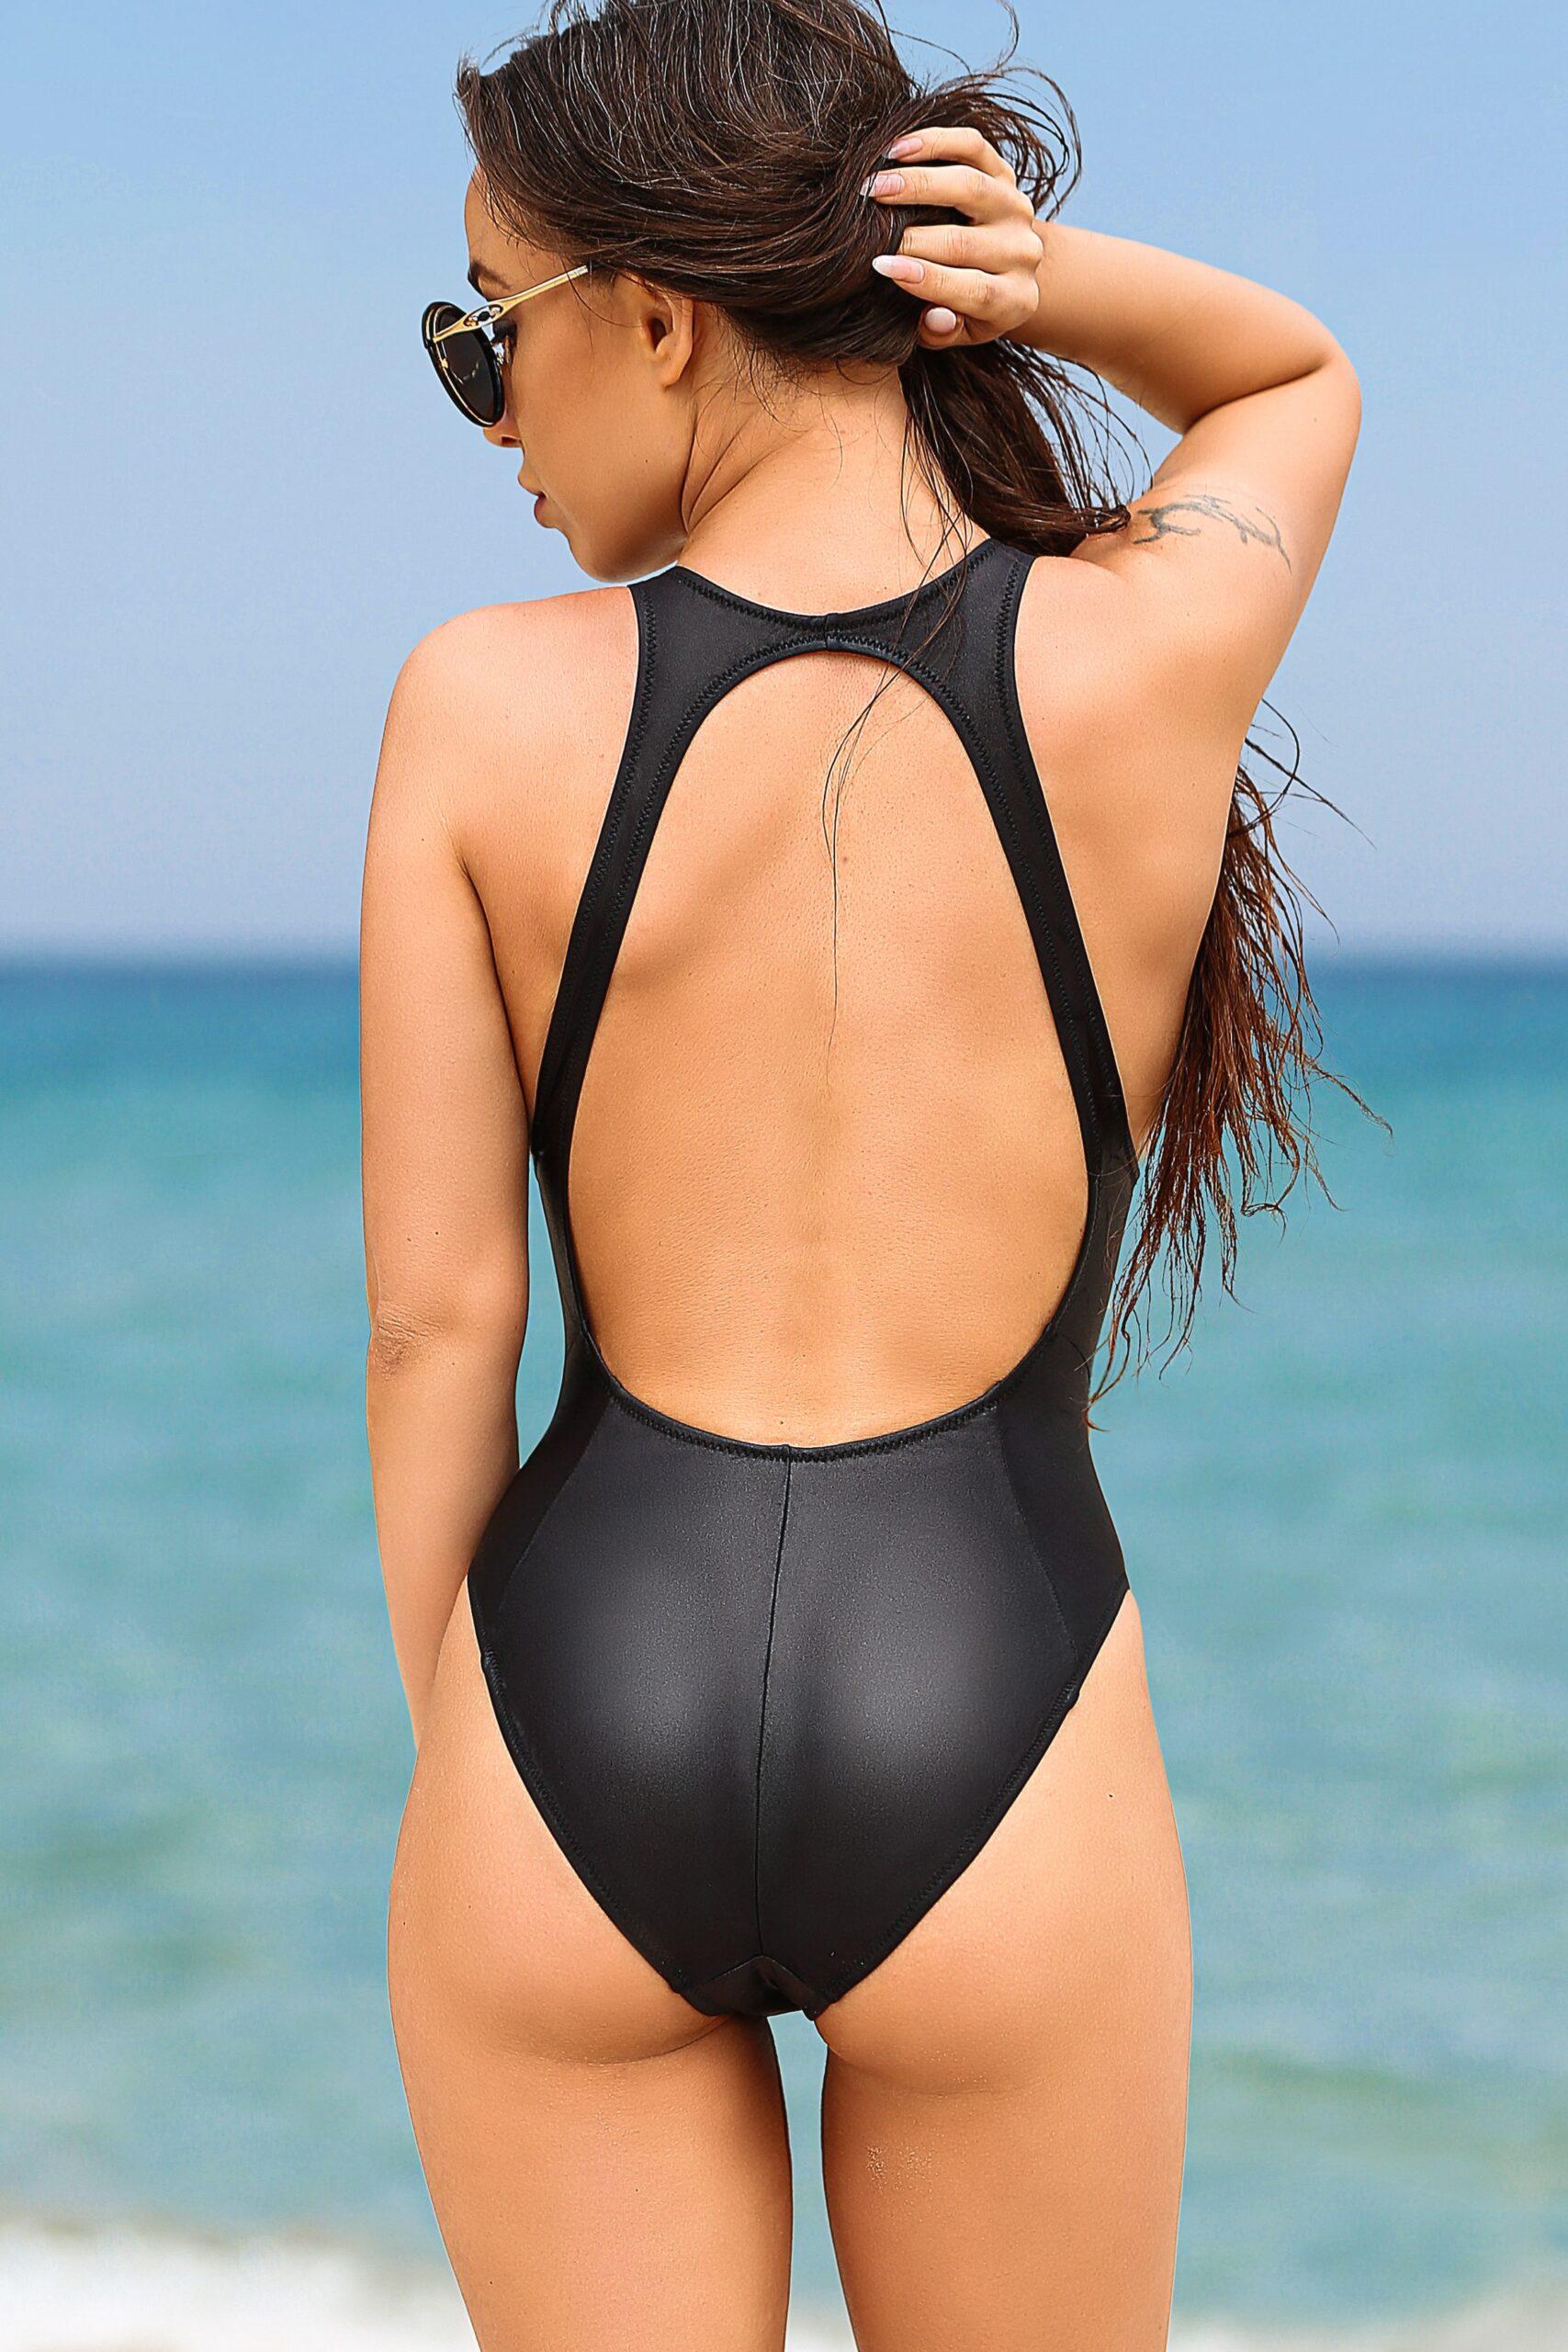 Sexy high cut leg one piece swimsuit. Hot black rave bodysuit. High waist designer womens rio swimwear. Cheeky extreme brazilian monokini.